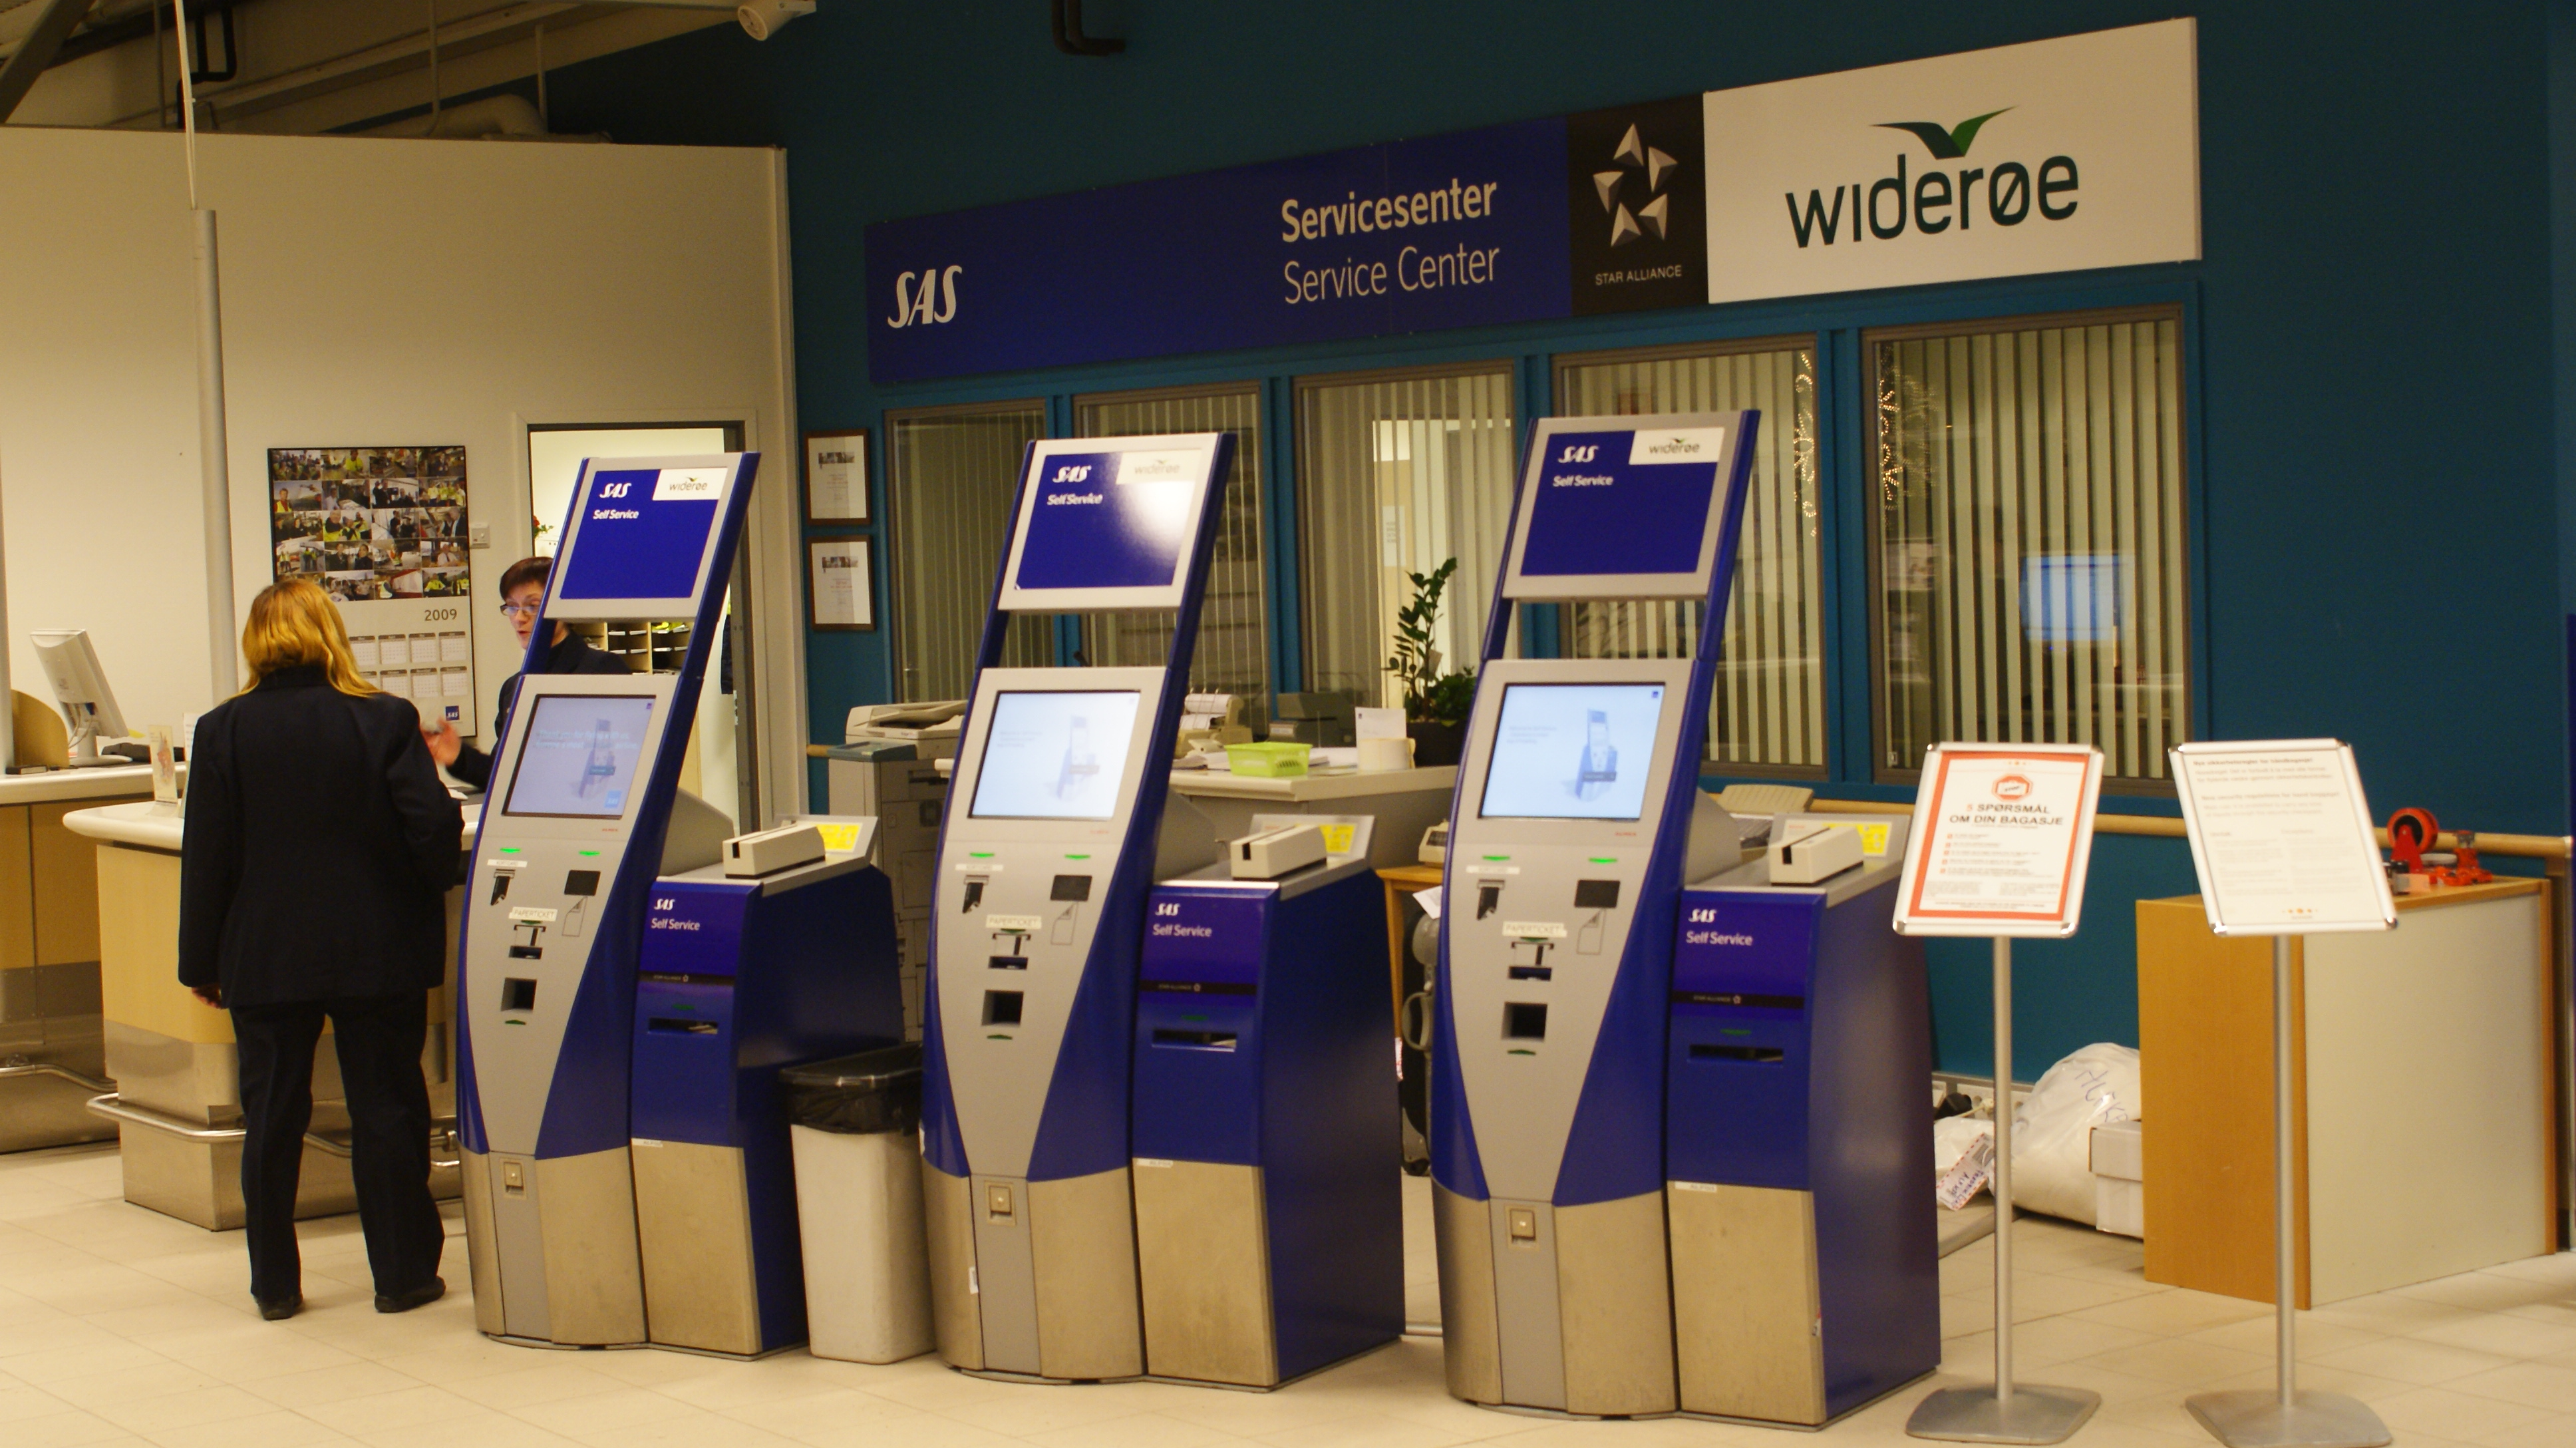 File:Alta-lufthavn-new-terminal-checkin-boxen.jpg - Wikimedia Commons